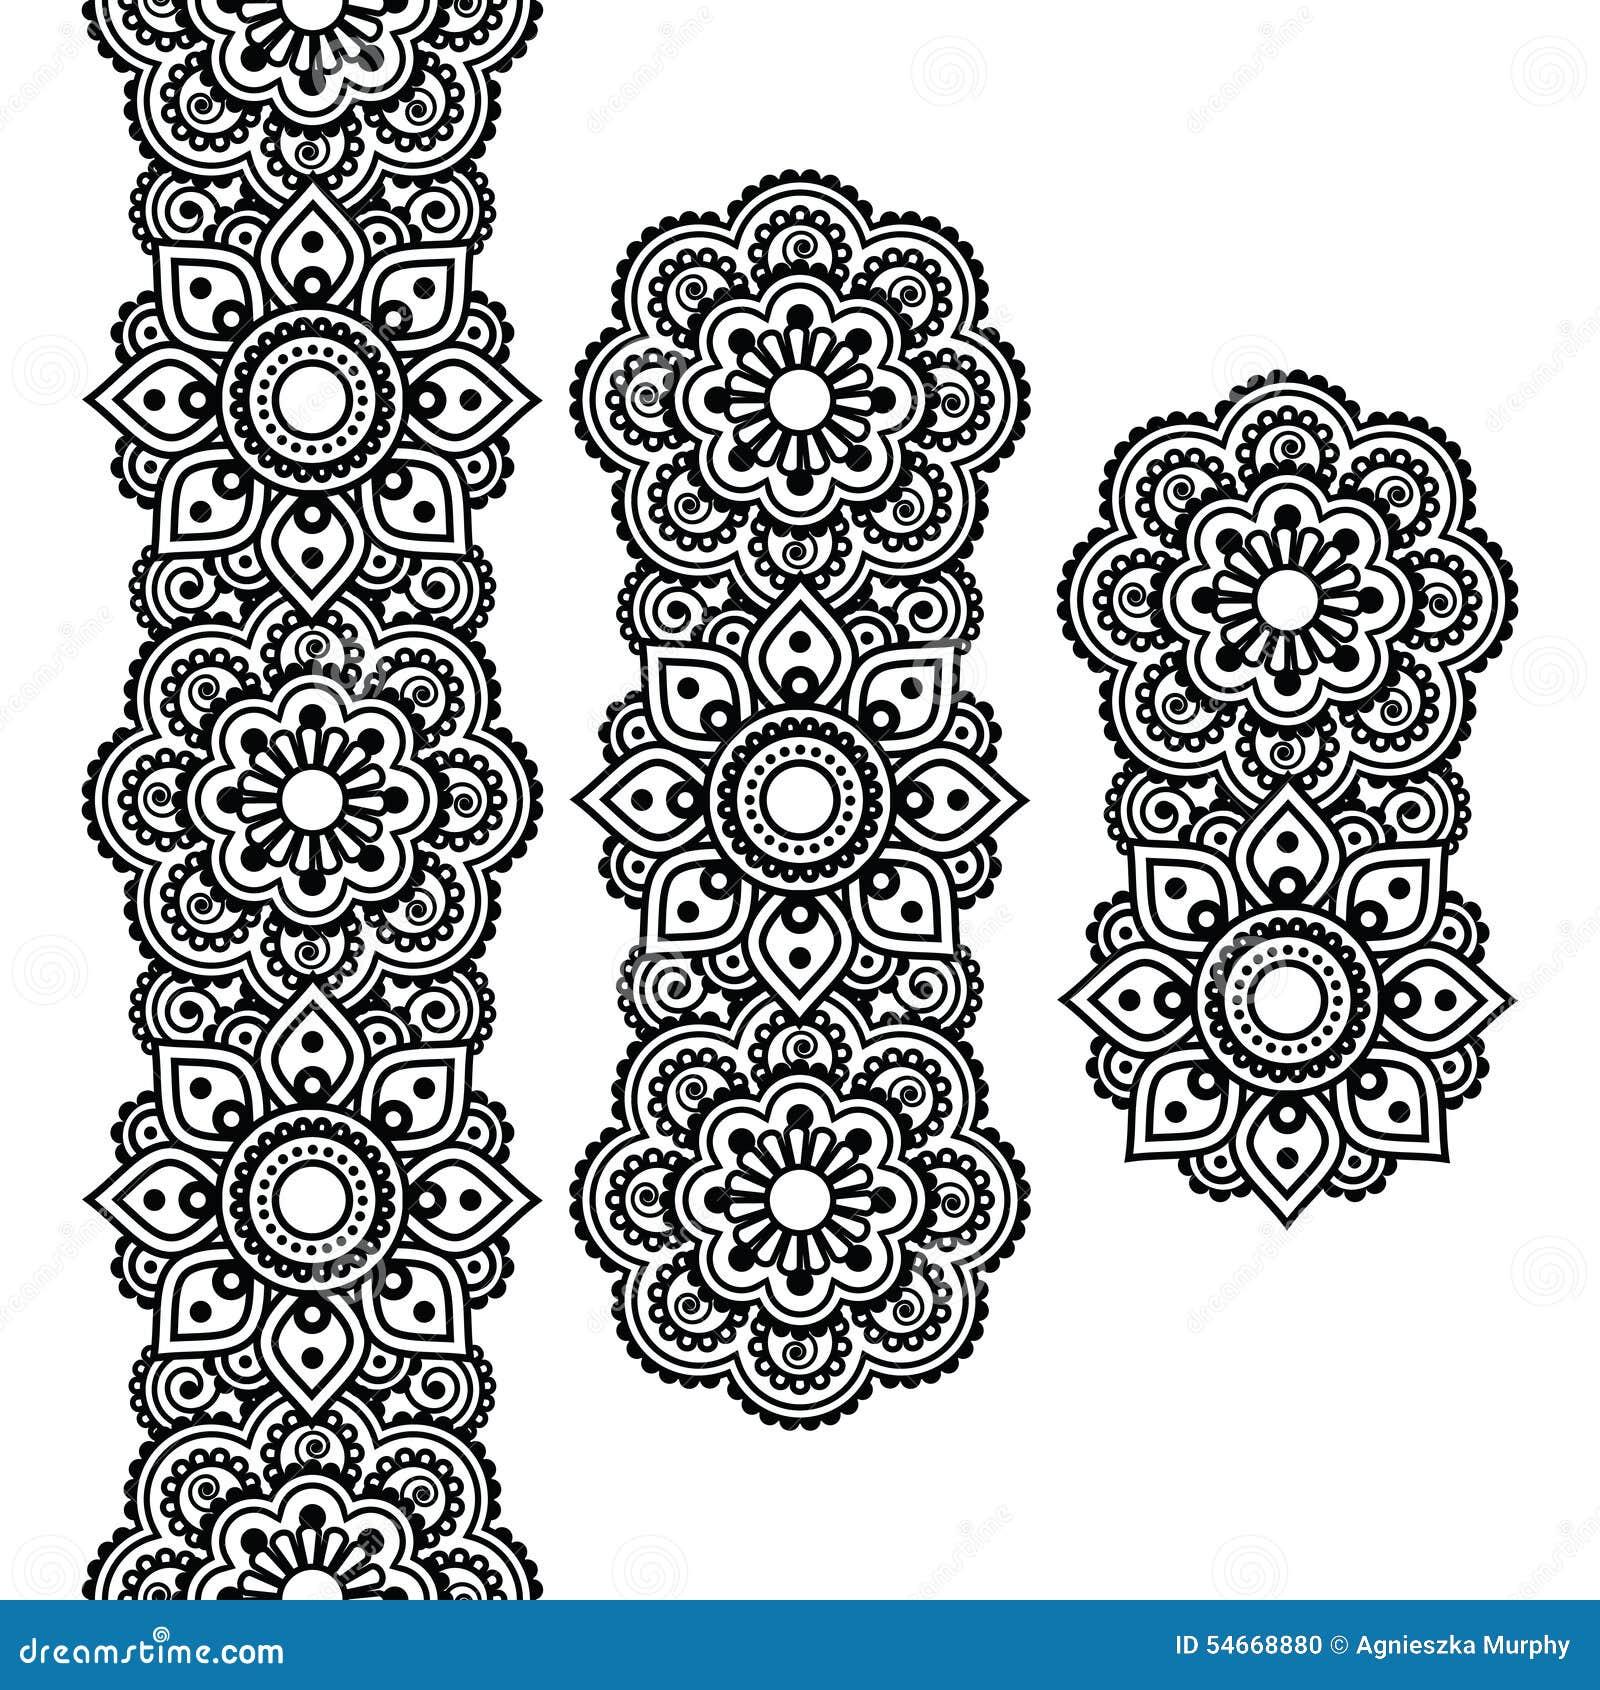 Mehndi Indian Henna Tattoo Long Pattern Design Elements